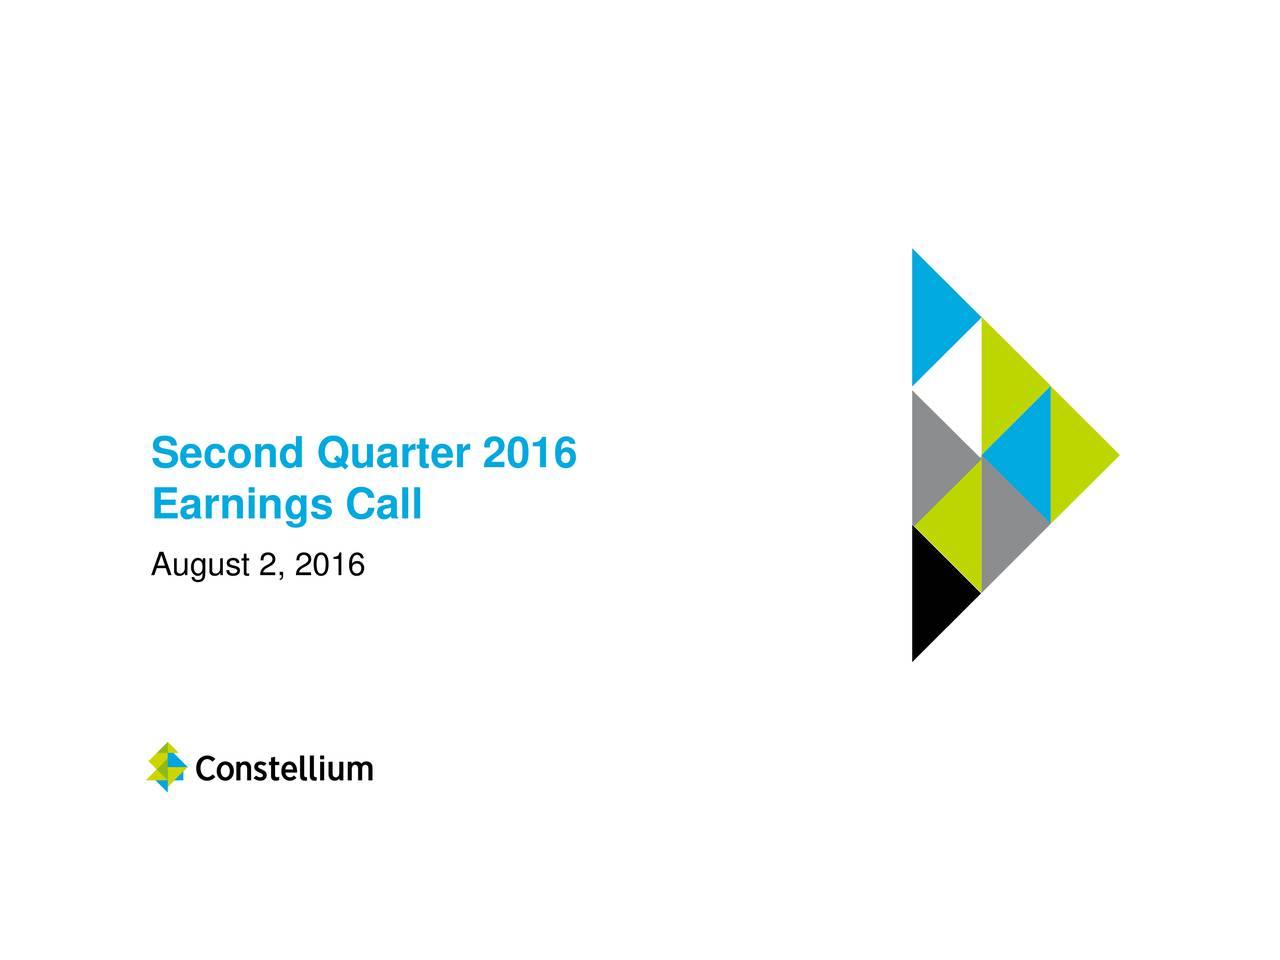 Earnings Call August 2, 2016